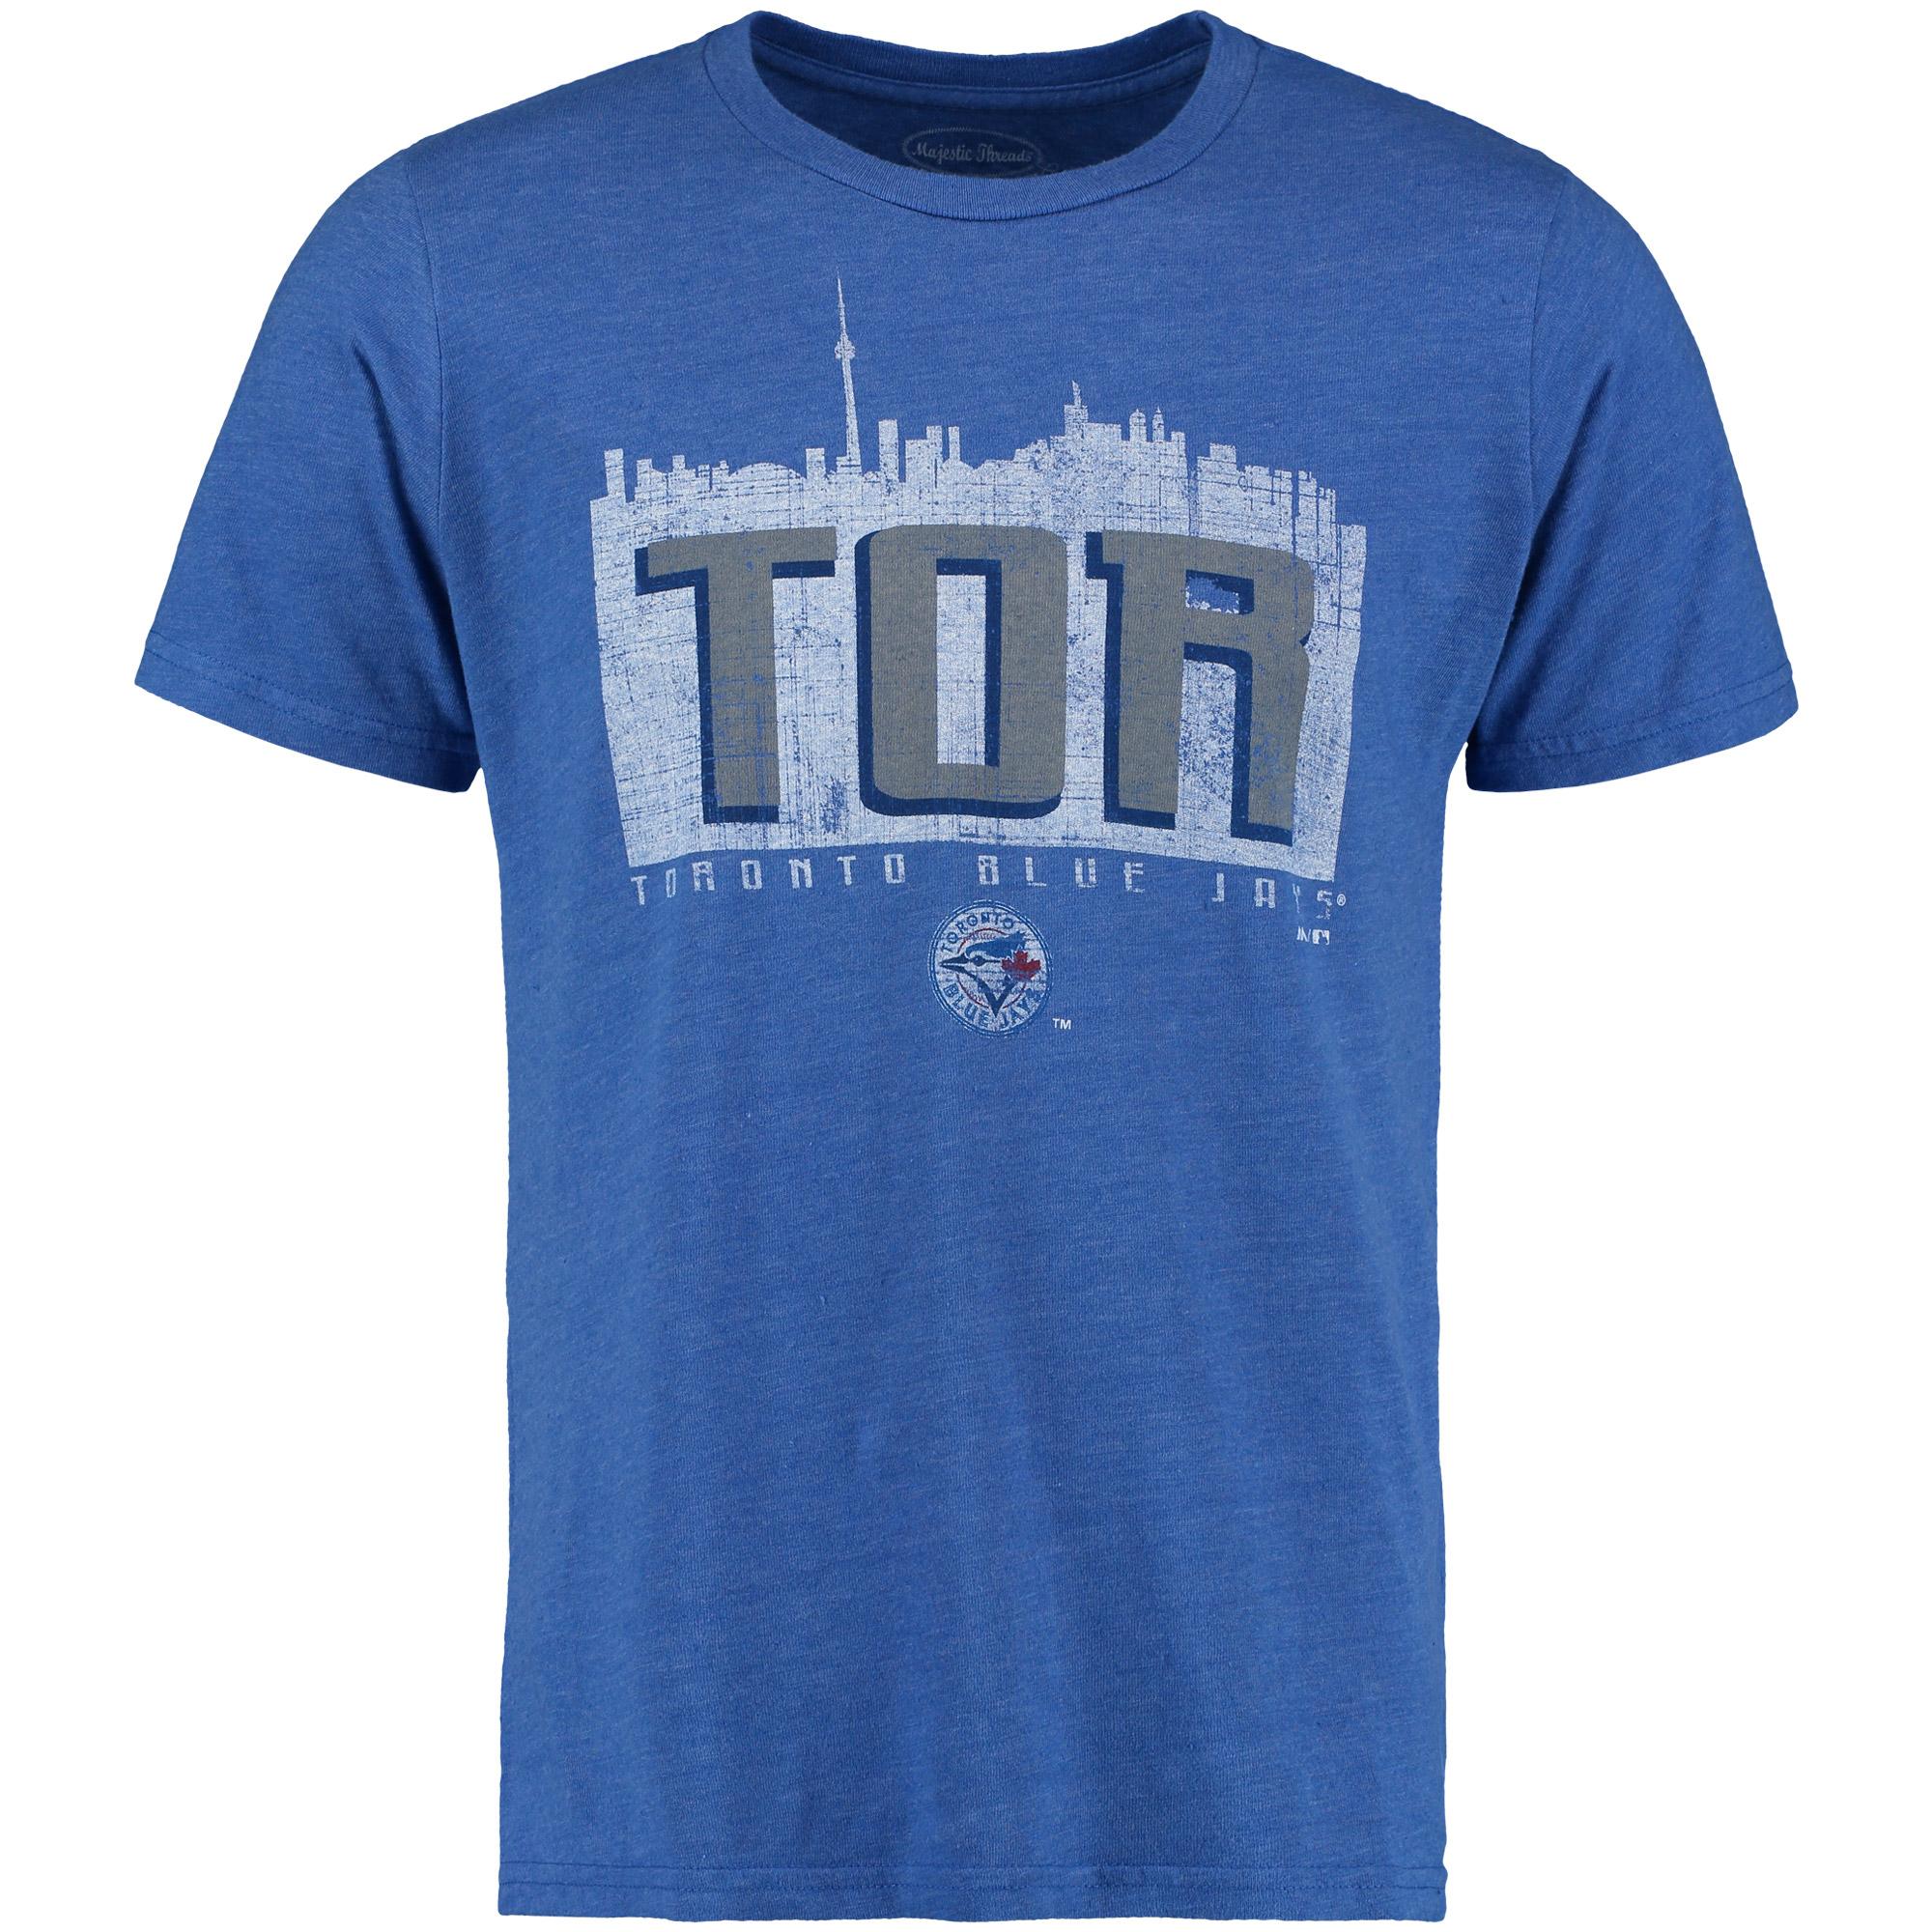 Toronto Blue Jays Majestic Threads Initial Skyline Premium Tri-Blend T-Shirt - Royal